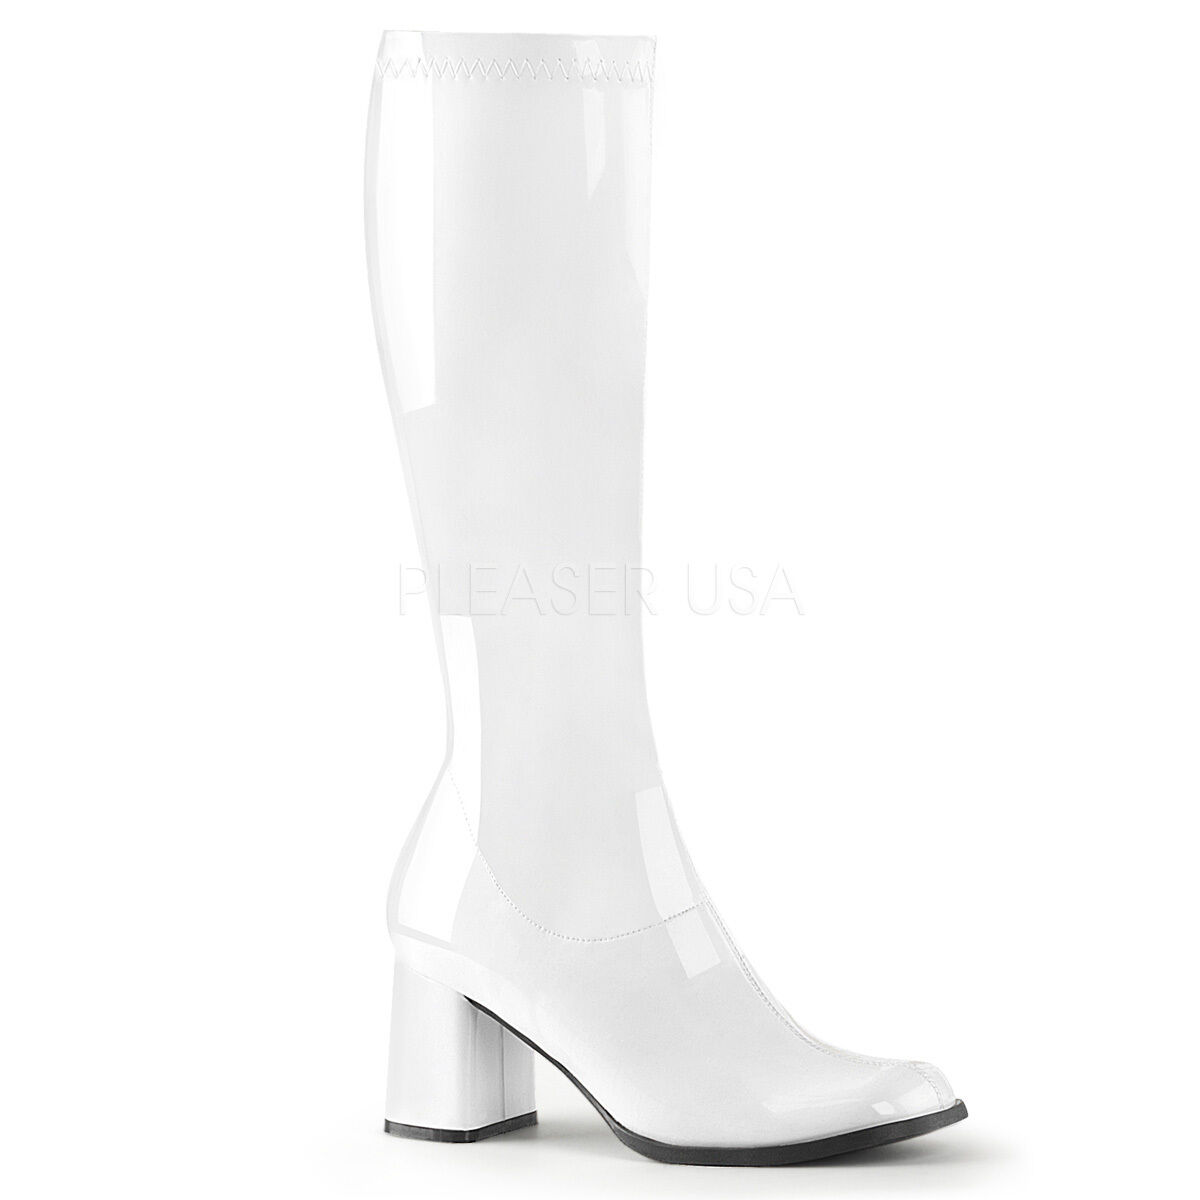 Zapatos especiales con descuento PLEASER FUNTASMA GOGO-300 WHITE PATENT 70'S DISCO KNEE HIGH RETRO BOOTS